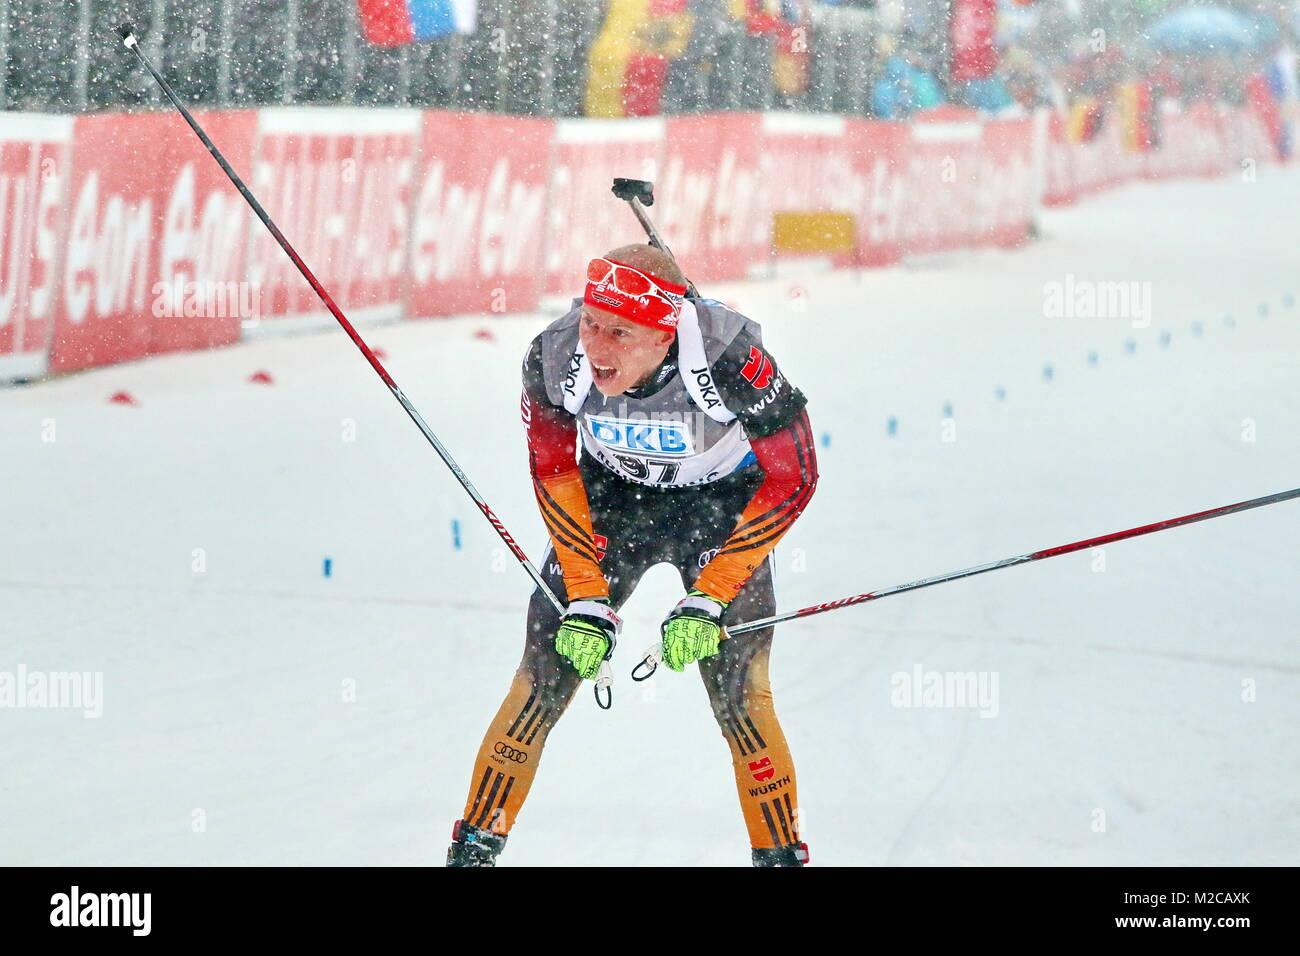 Daniel Böhm daniel böhm sc buntenbock beim zieleinlauf ibu weltcup biathlon